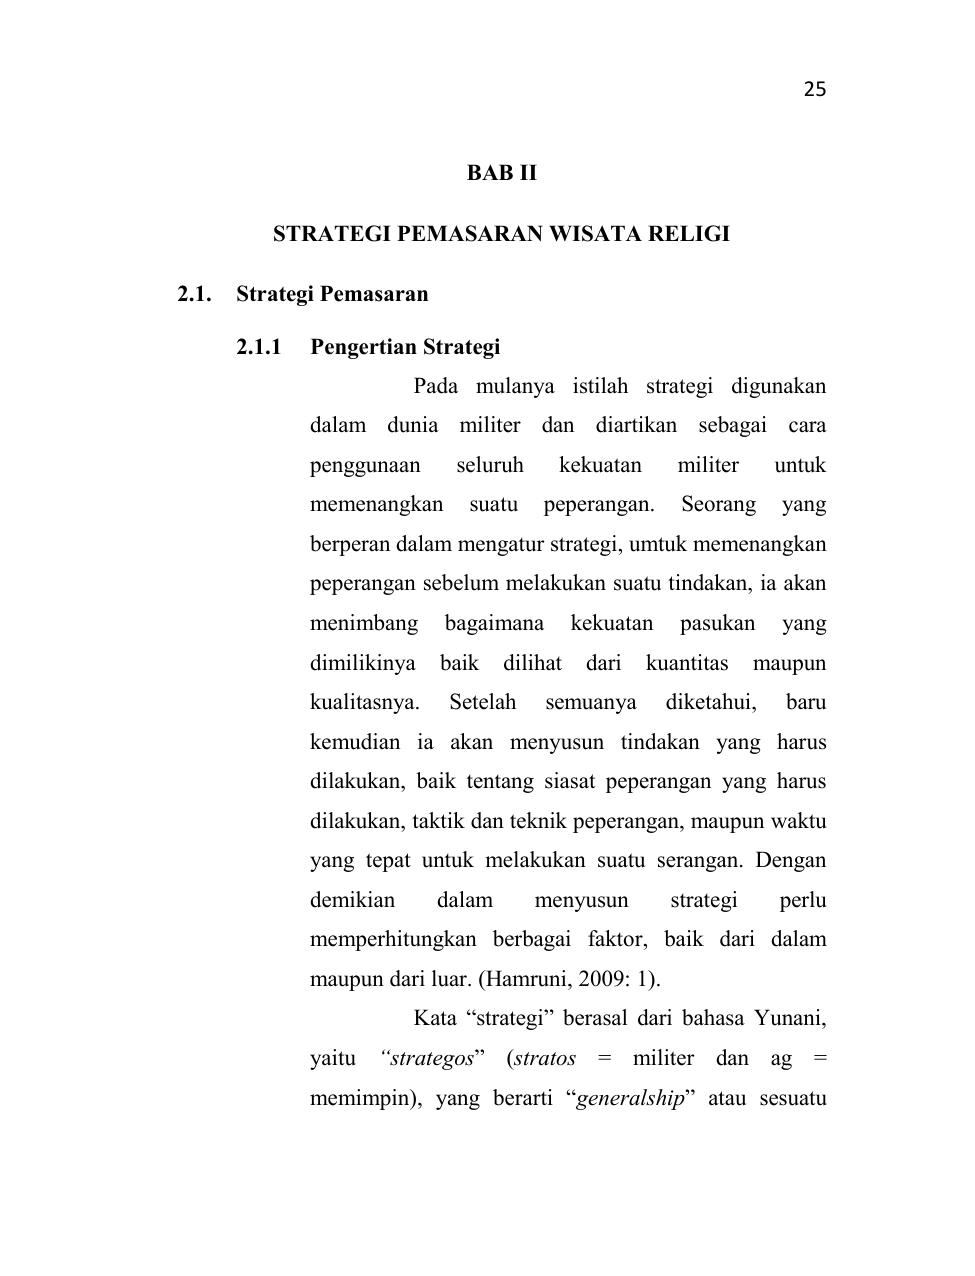 7 BAB II STRATEGI PEMASARAN WISATA RELIGI 7.7. Strategi